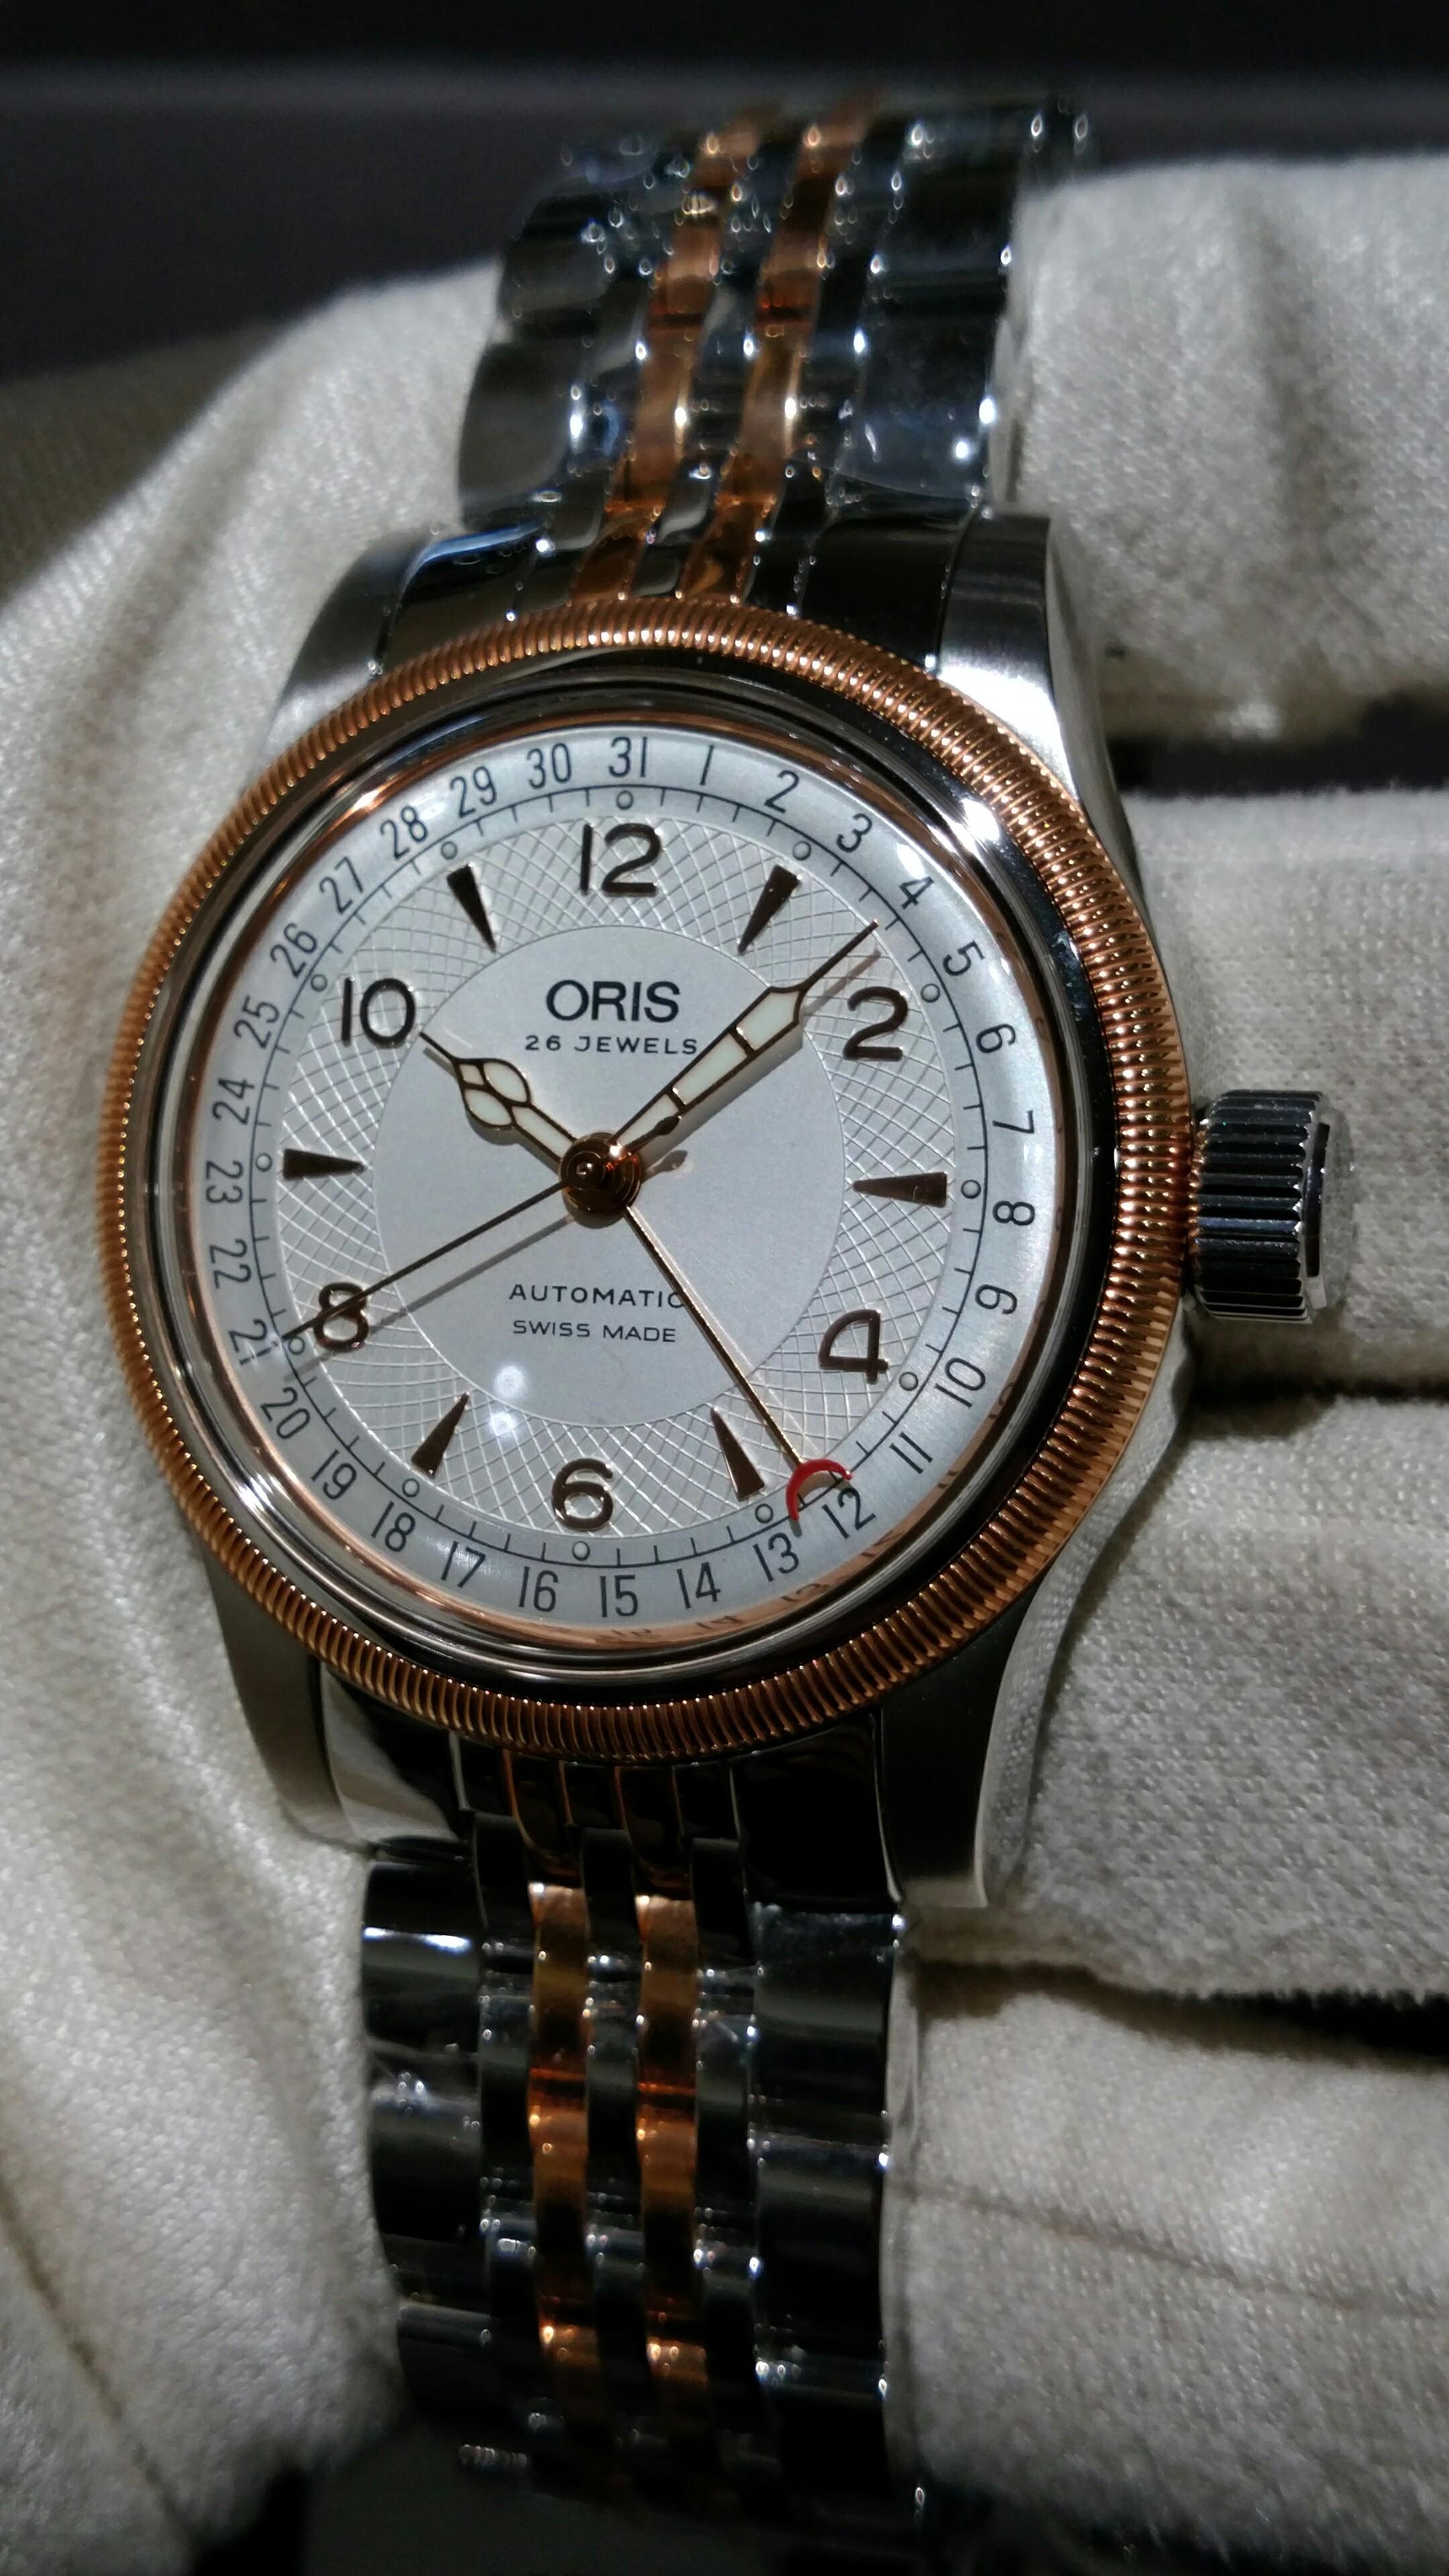 buy online 635d2 1caf2 サロン・ド・サセ スタッフブログ オリス 時計